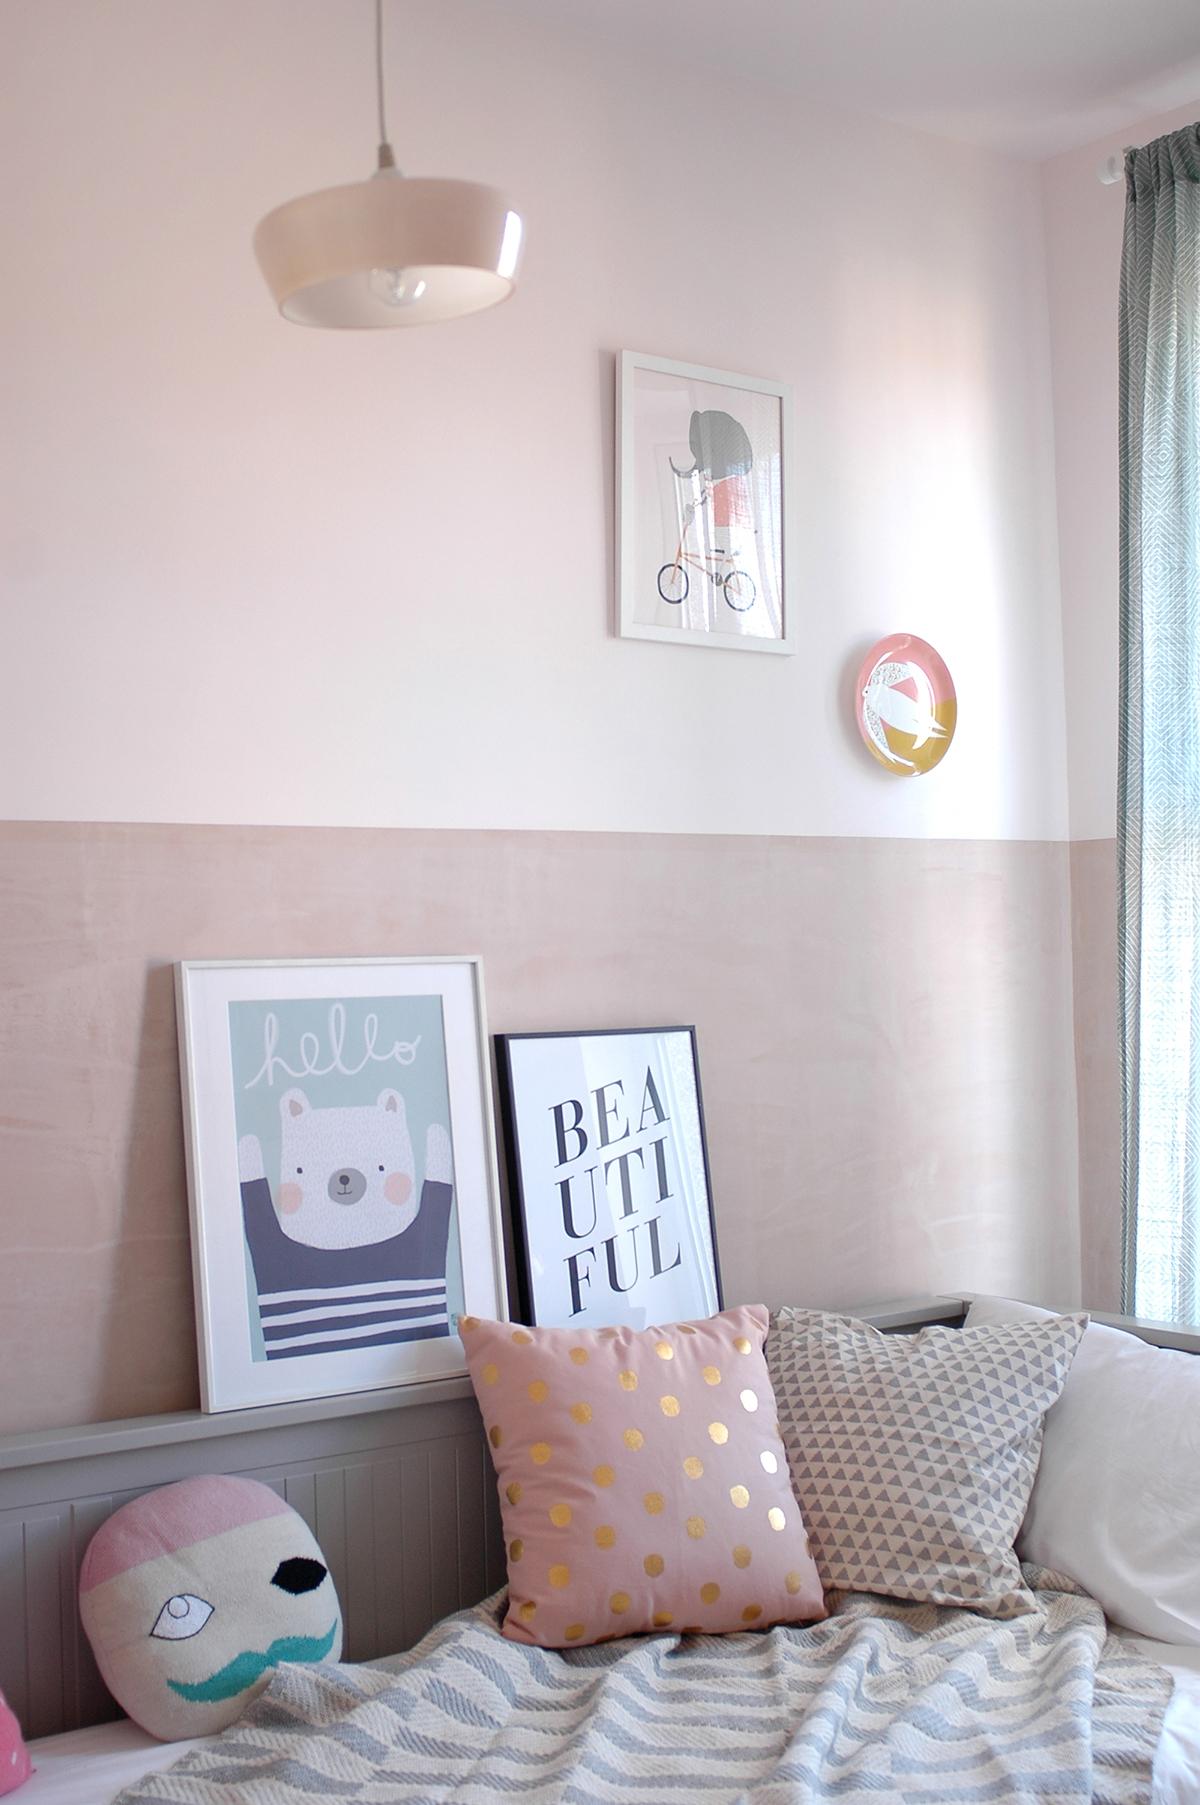 Day bed : Ikea /  Vintage pendant light : V Interior /  Curtain : H&M /  Pirate cushion by Lucky Boy Sunday/  Spotty cushion : Rigby and Mac (via Trouva) /  Triangle cushion : H&M /  Throw : Oliver Bonas /  Elephant print : Petit Pippin /  Bird plate : Donna WIlson via Moonko / Hello bear print  by Aless Baylis /  Beautiful print : John Lewis